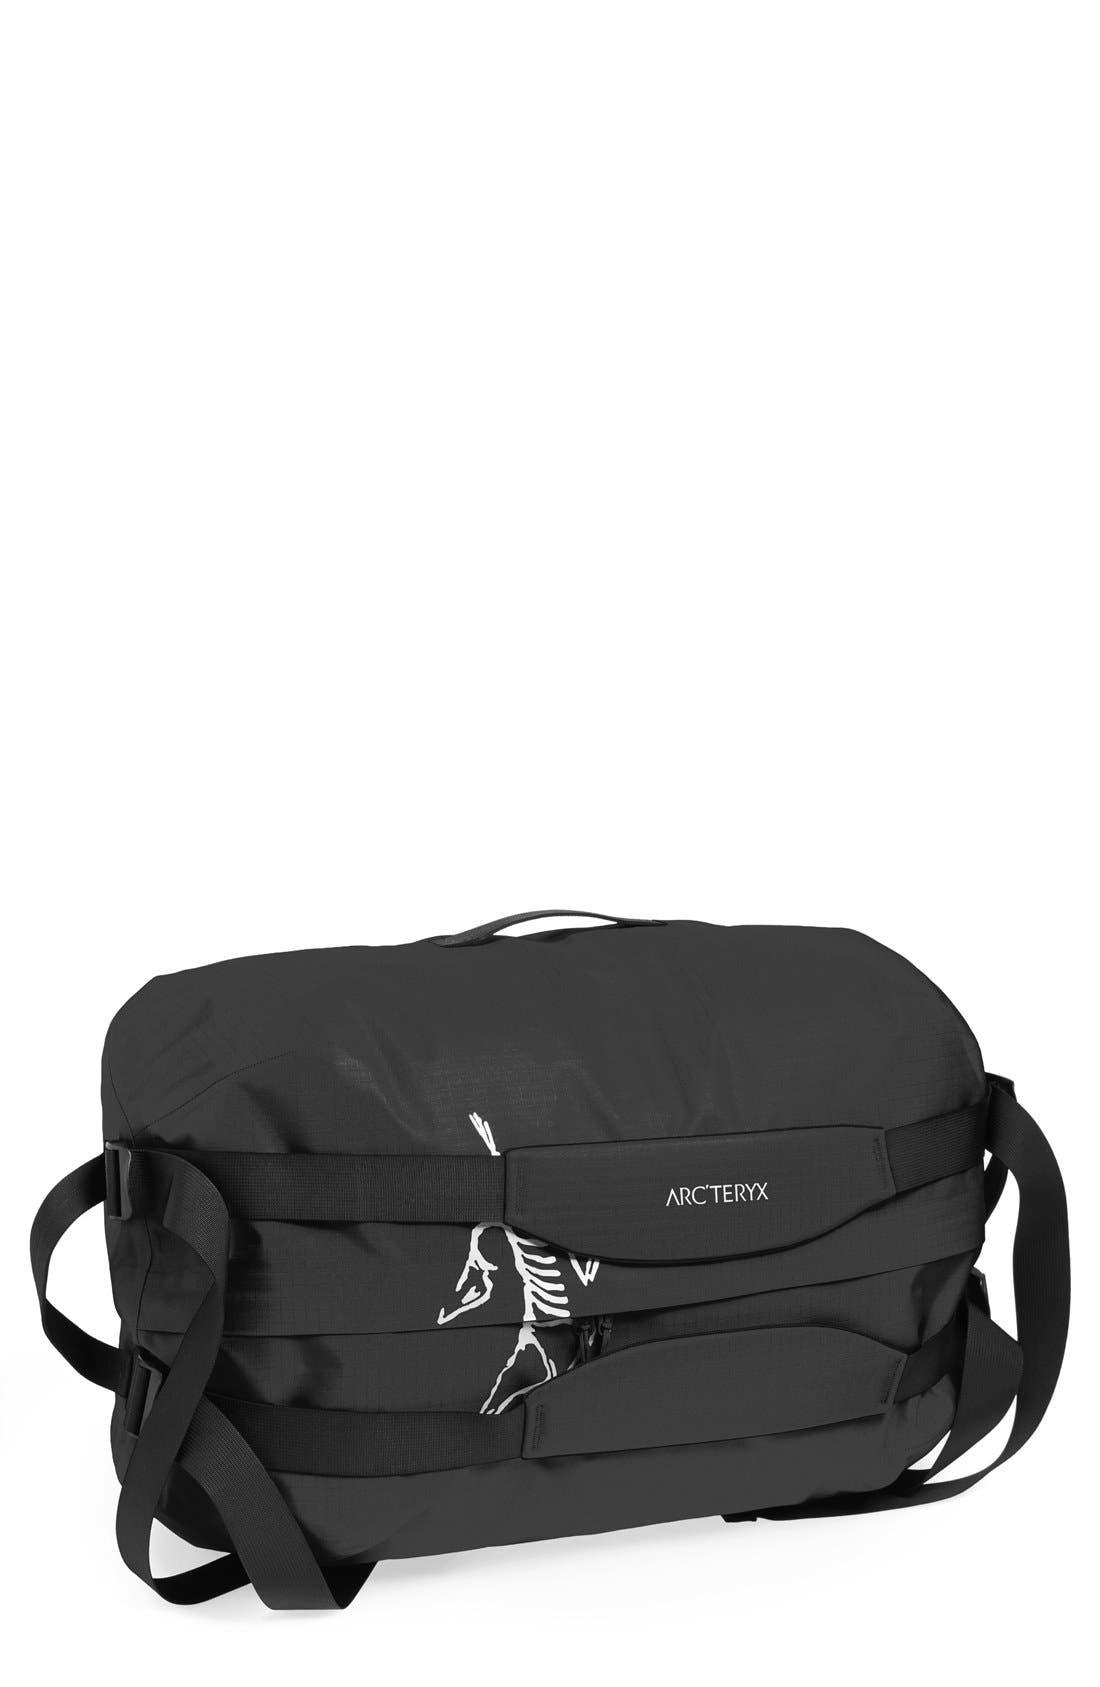 Alternate Image 1 Selected - Arc'teryx 'Carrier' Weather Resistant Convertible Duffel Bag/Backpack (50 liter)